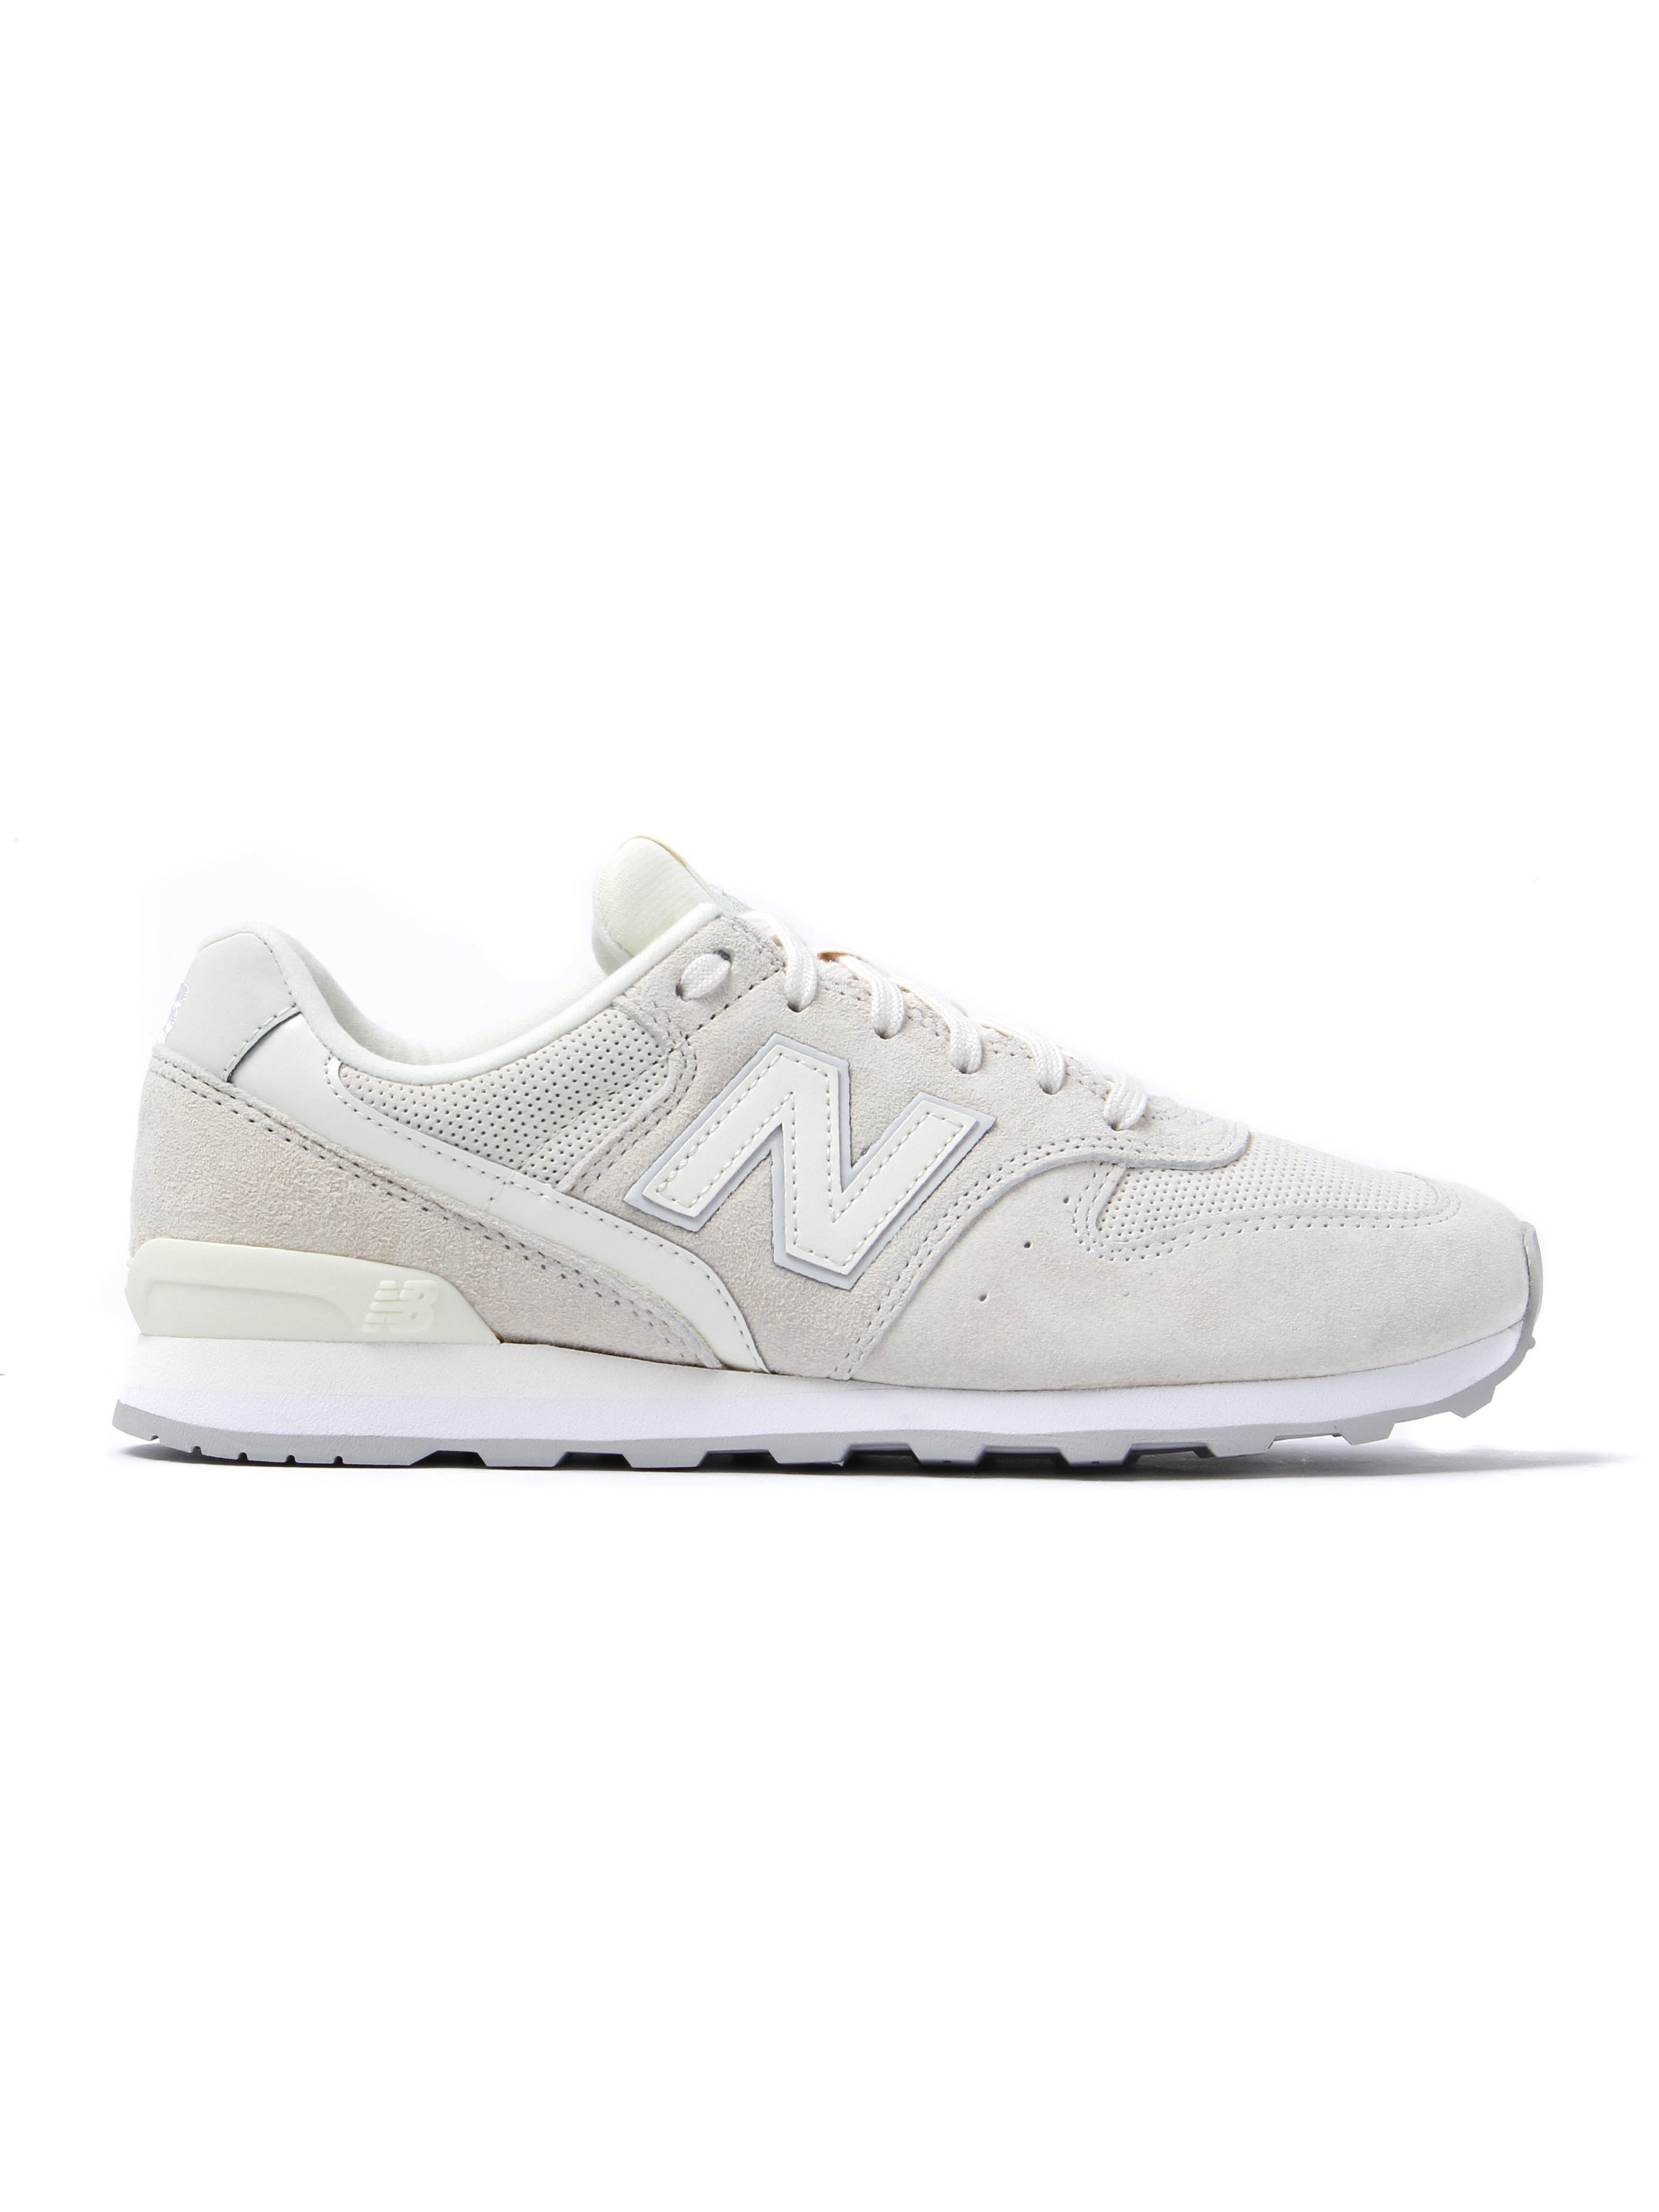 New Balance Women's 996 Trainers - Cream Suede